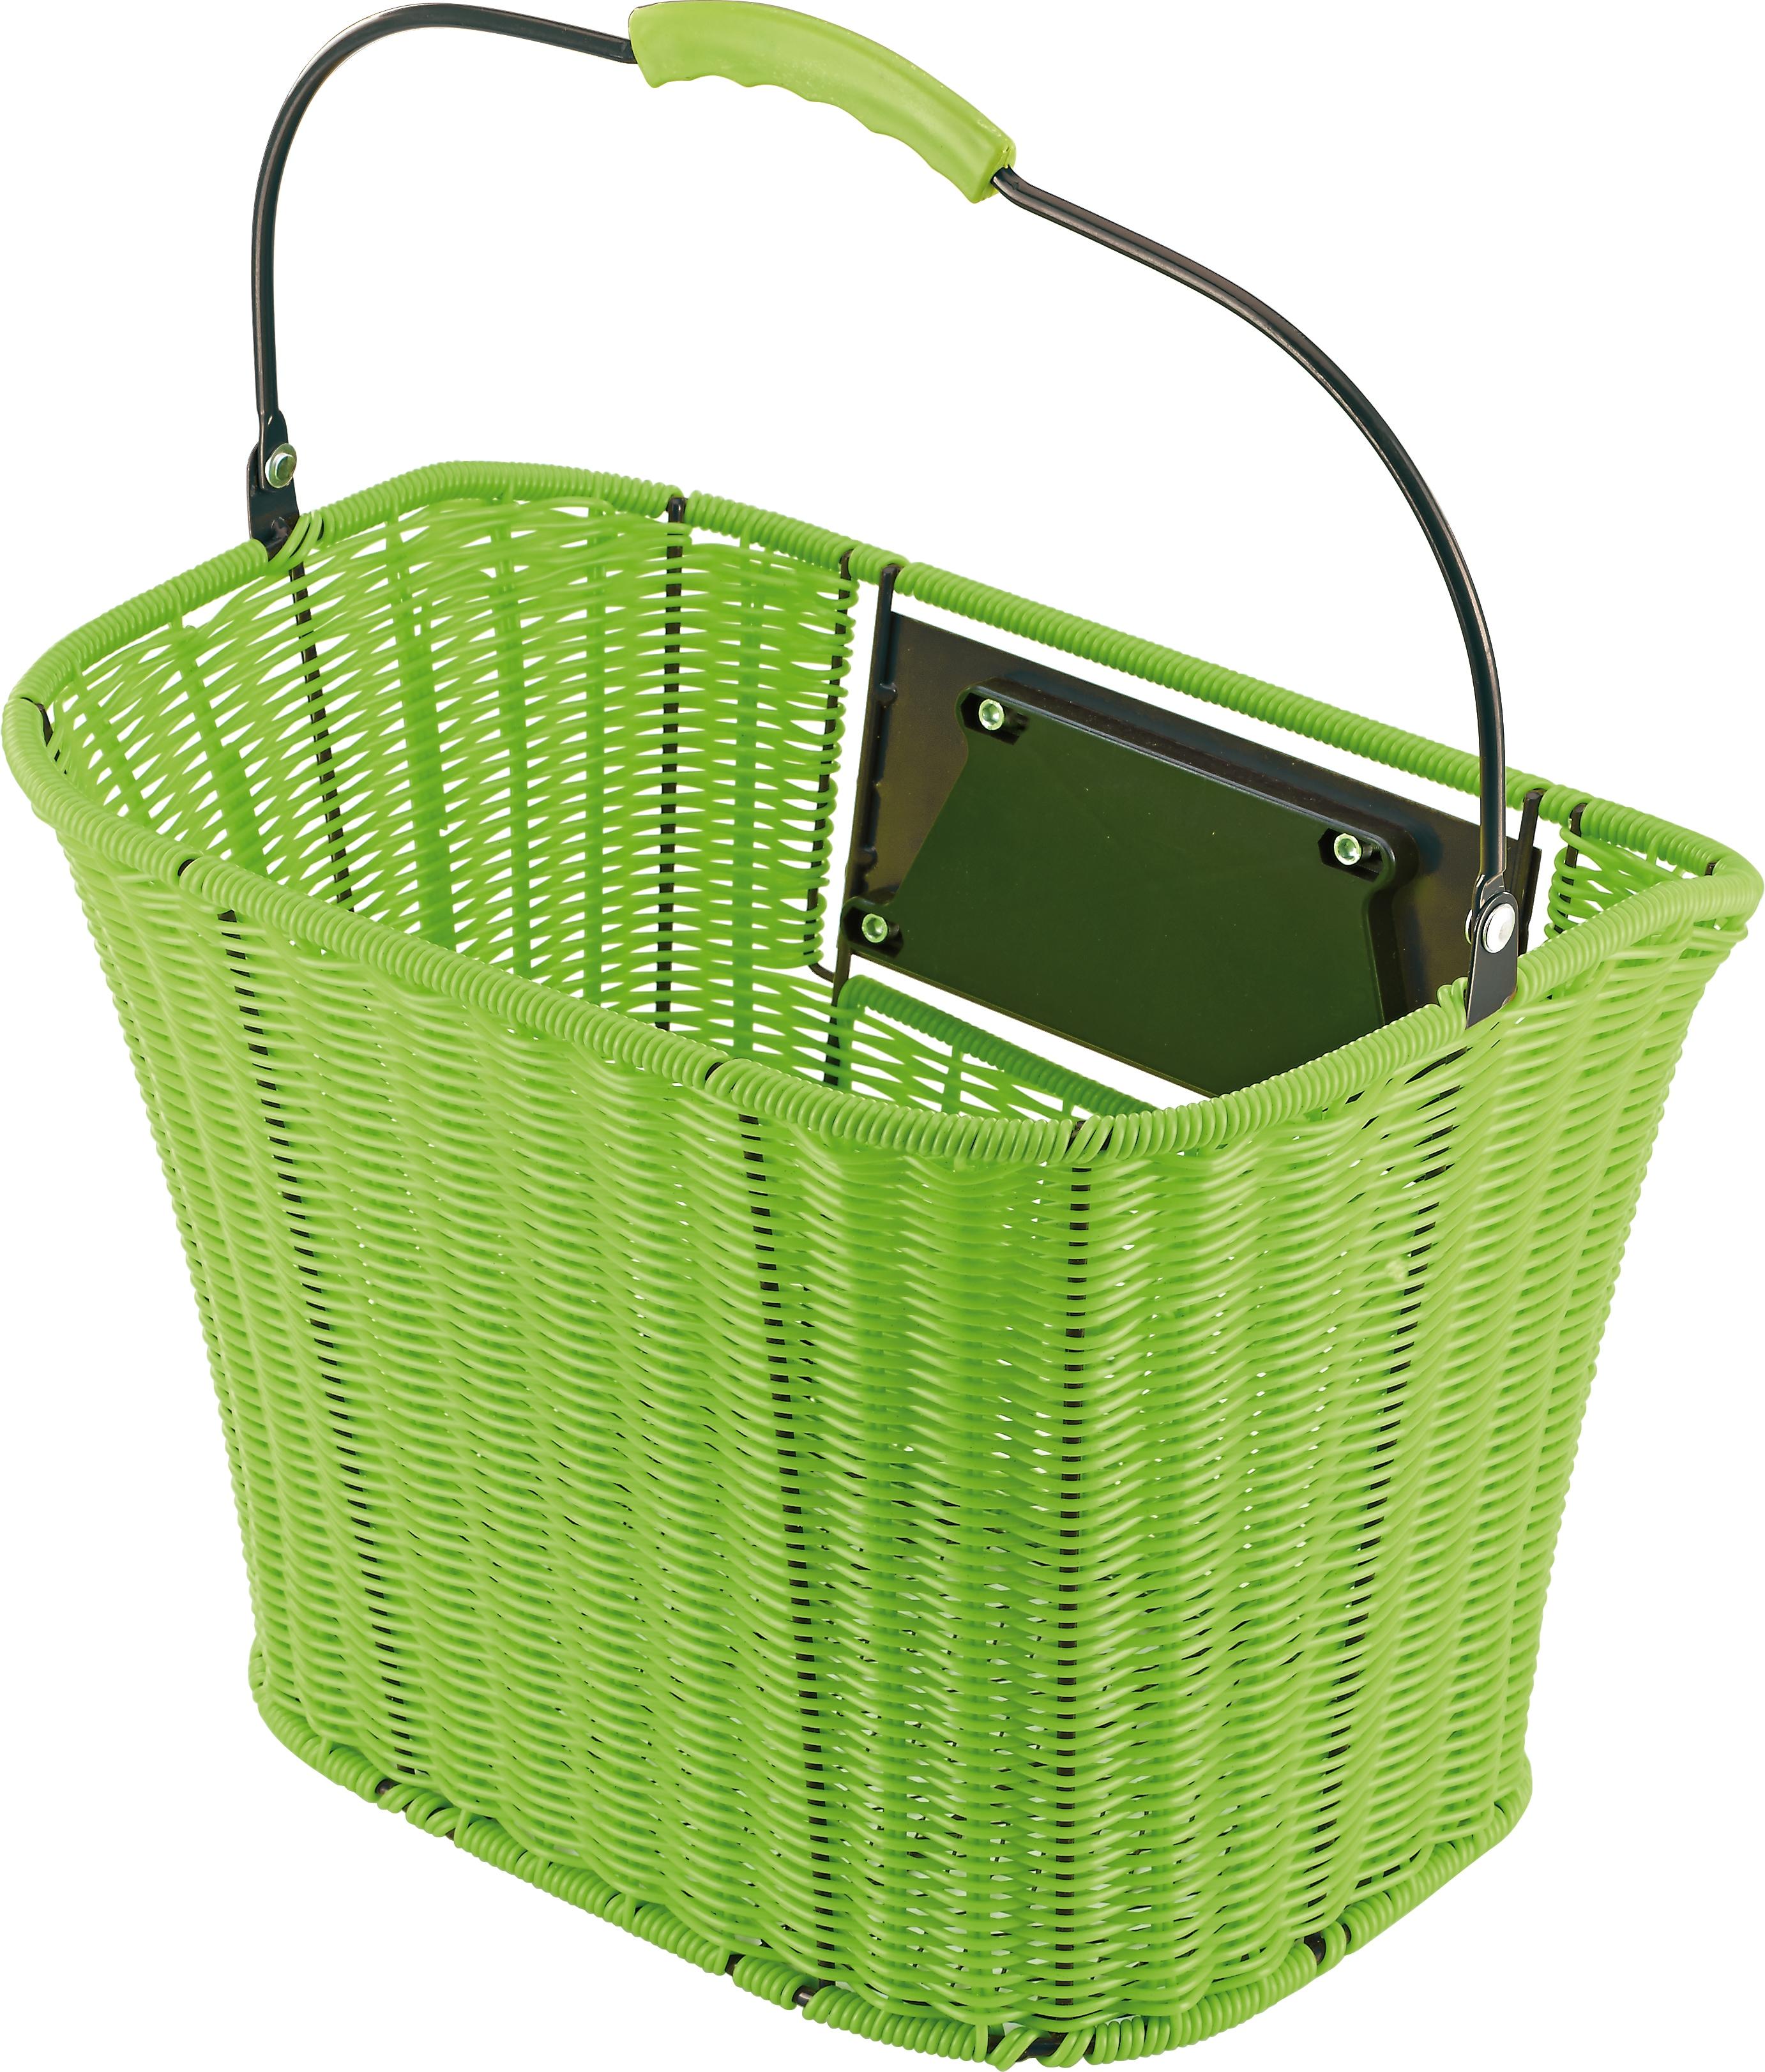 Prophete Fahrradkorb, grün